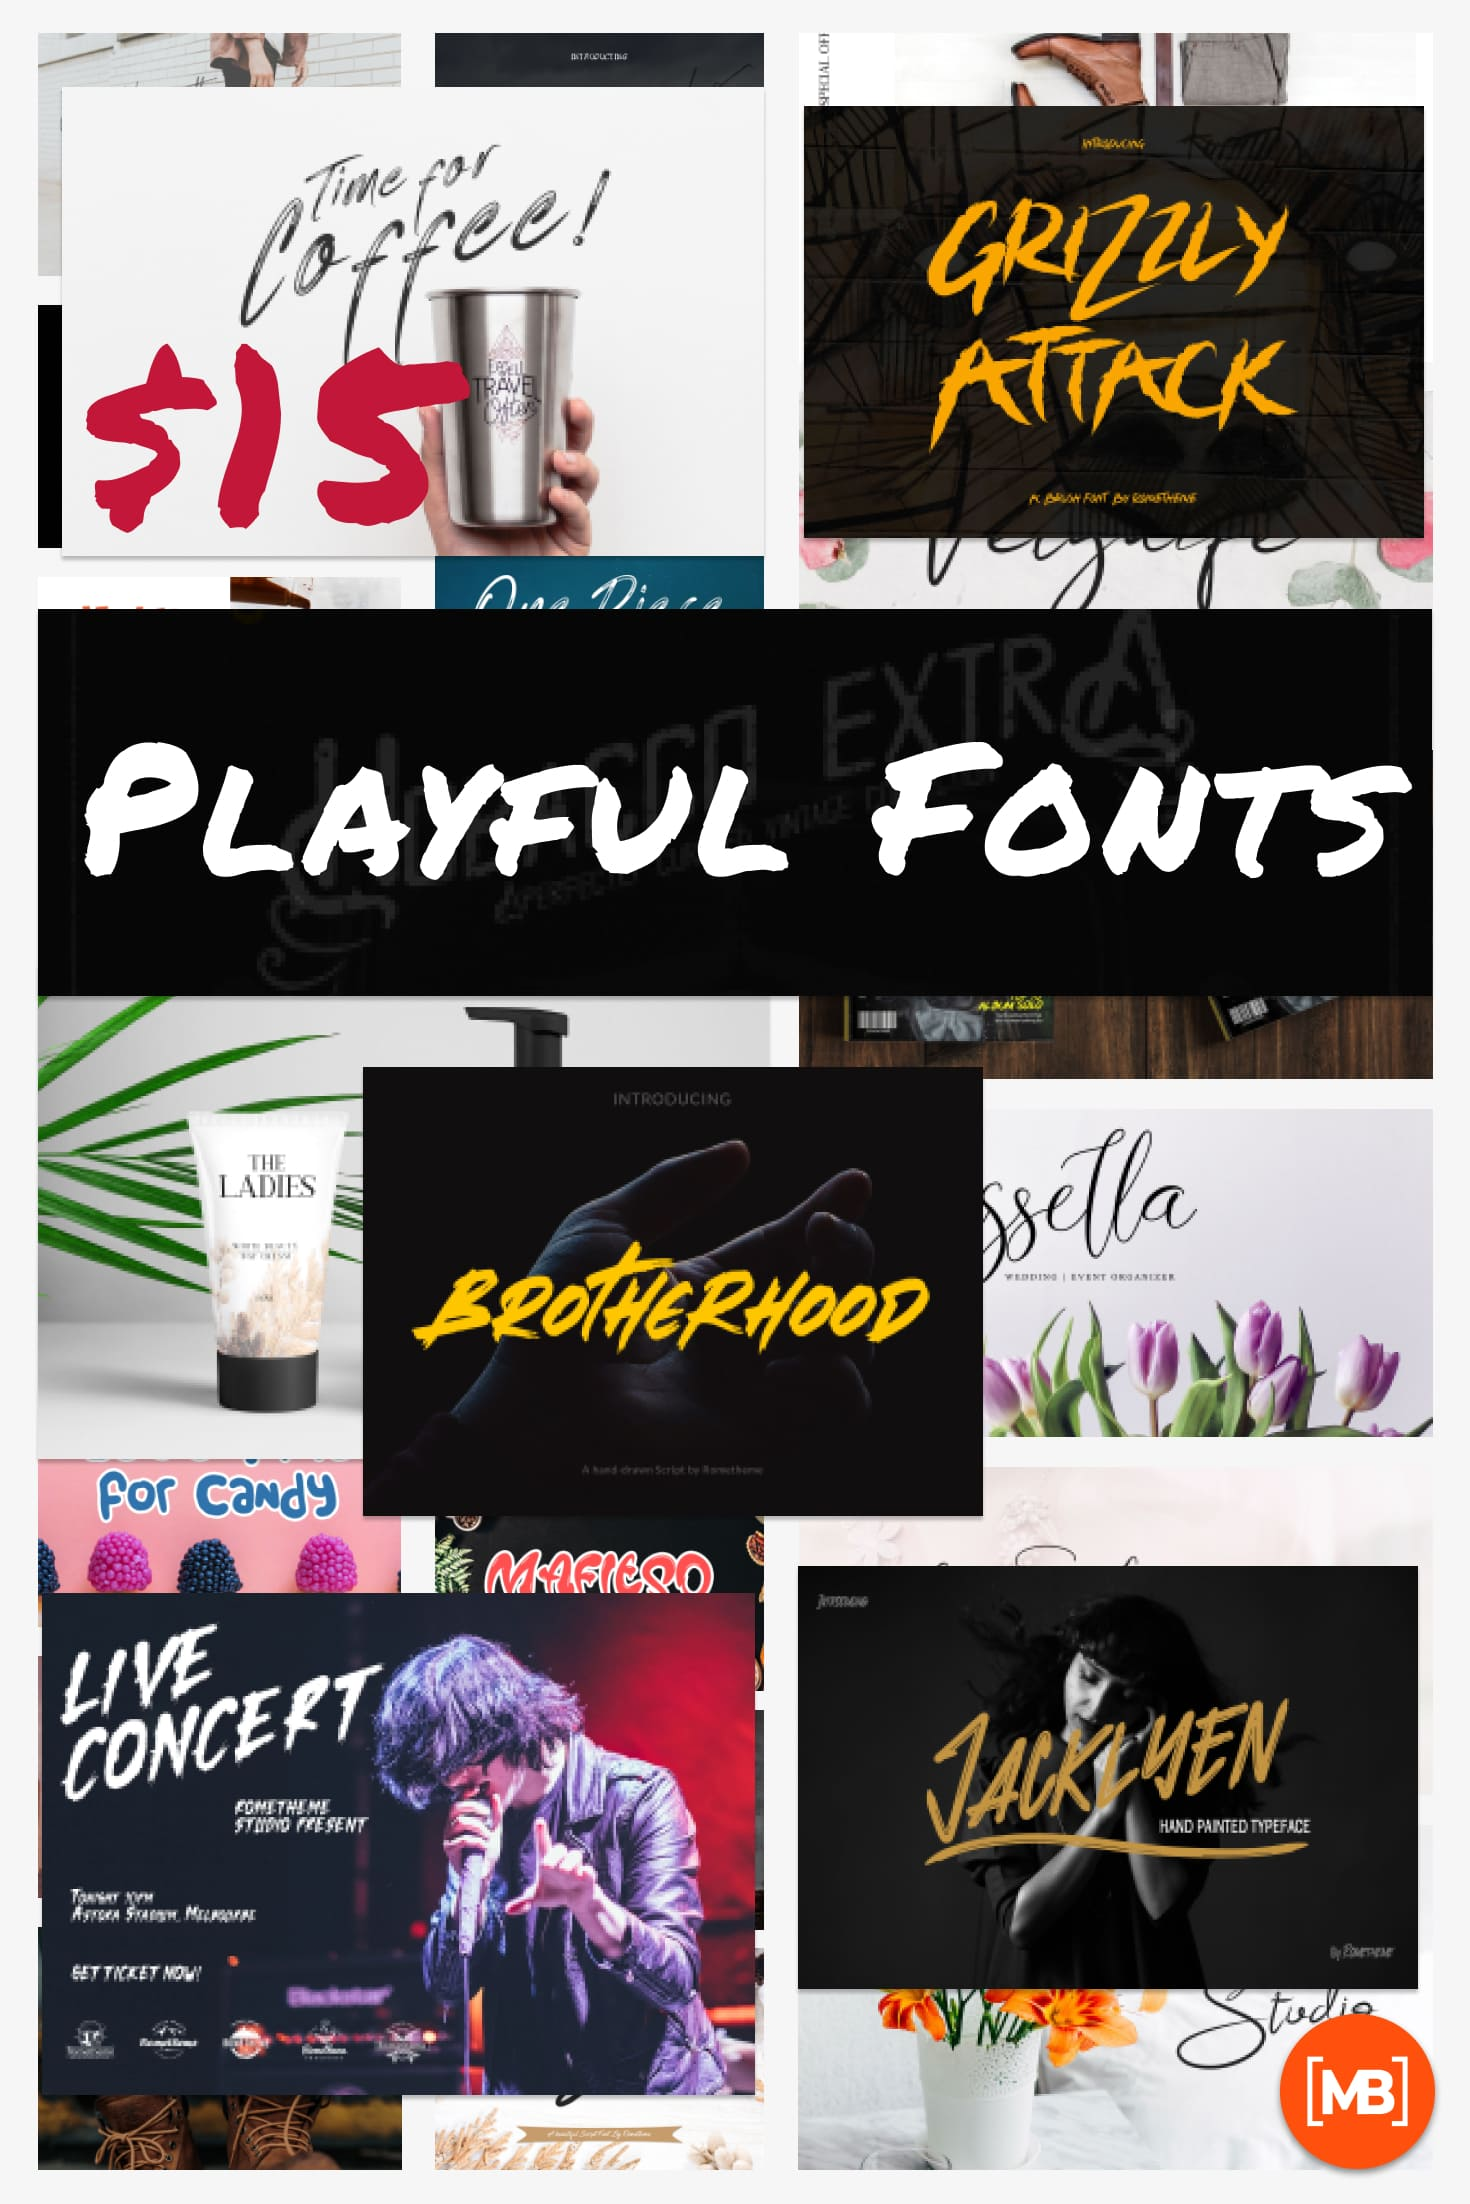 Pinterest Image: Playful Fonts - Exclusive Font Bundle - 30 Items for $15.